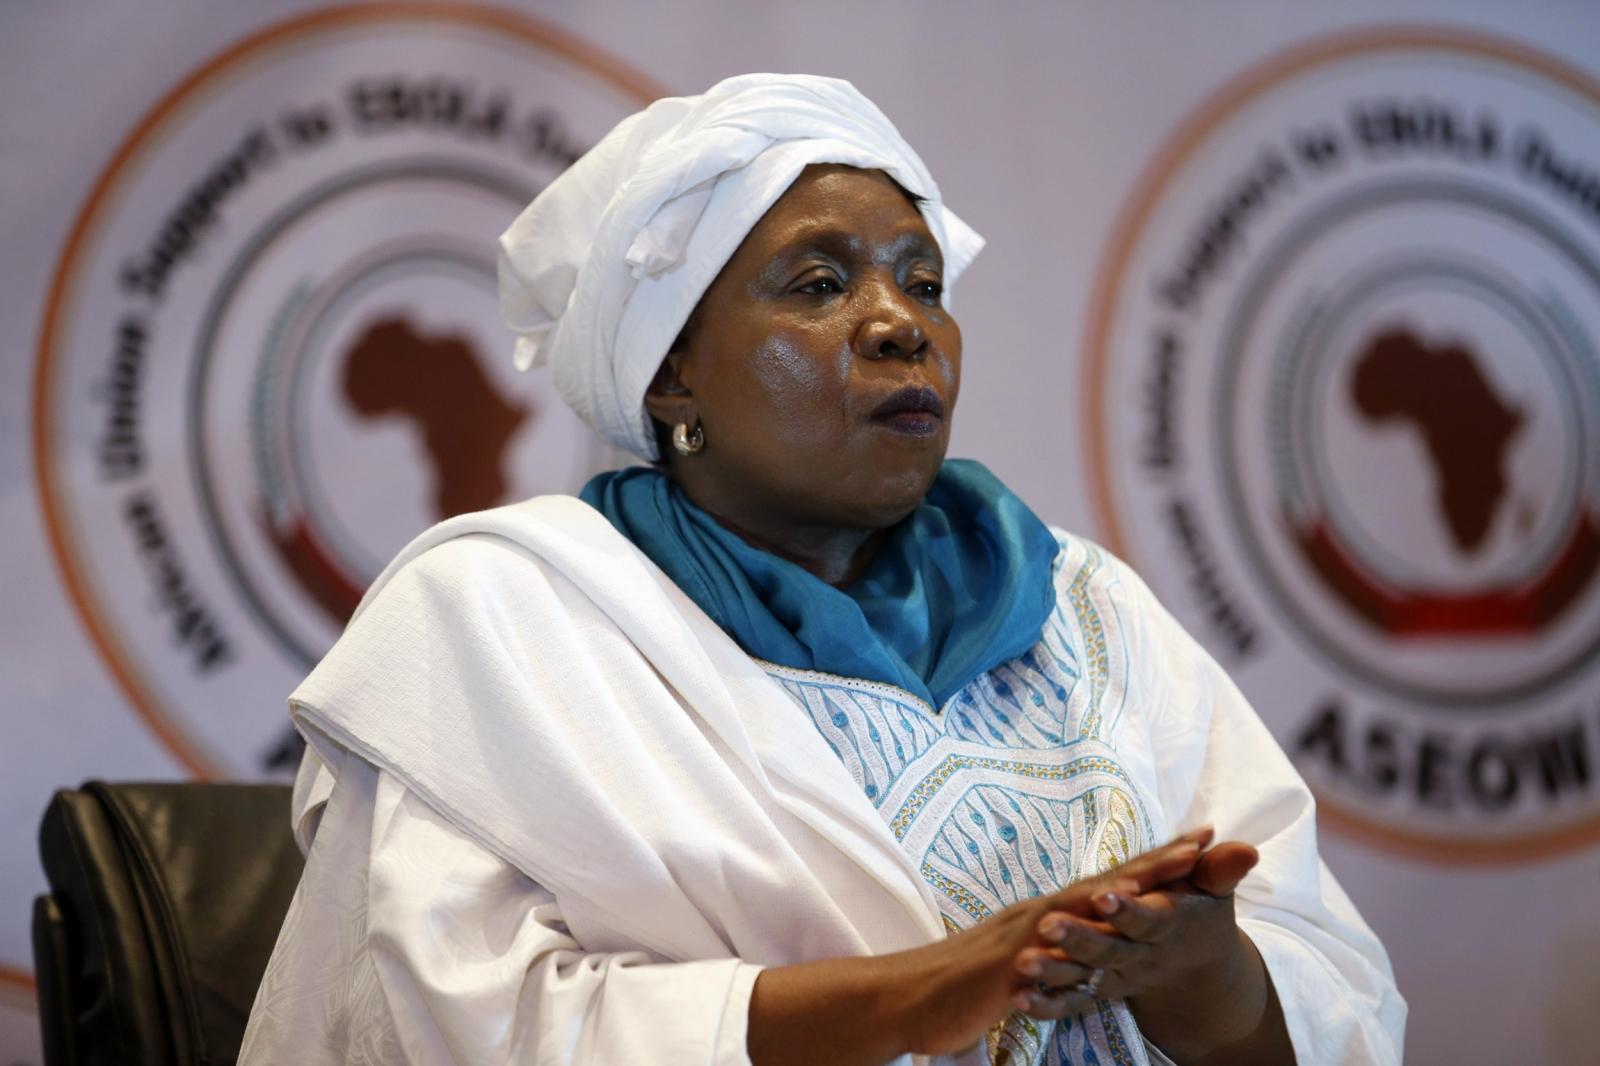 Nkosazana Dlamini-Zuma, the outgoing head of the African Union (AU)